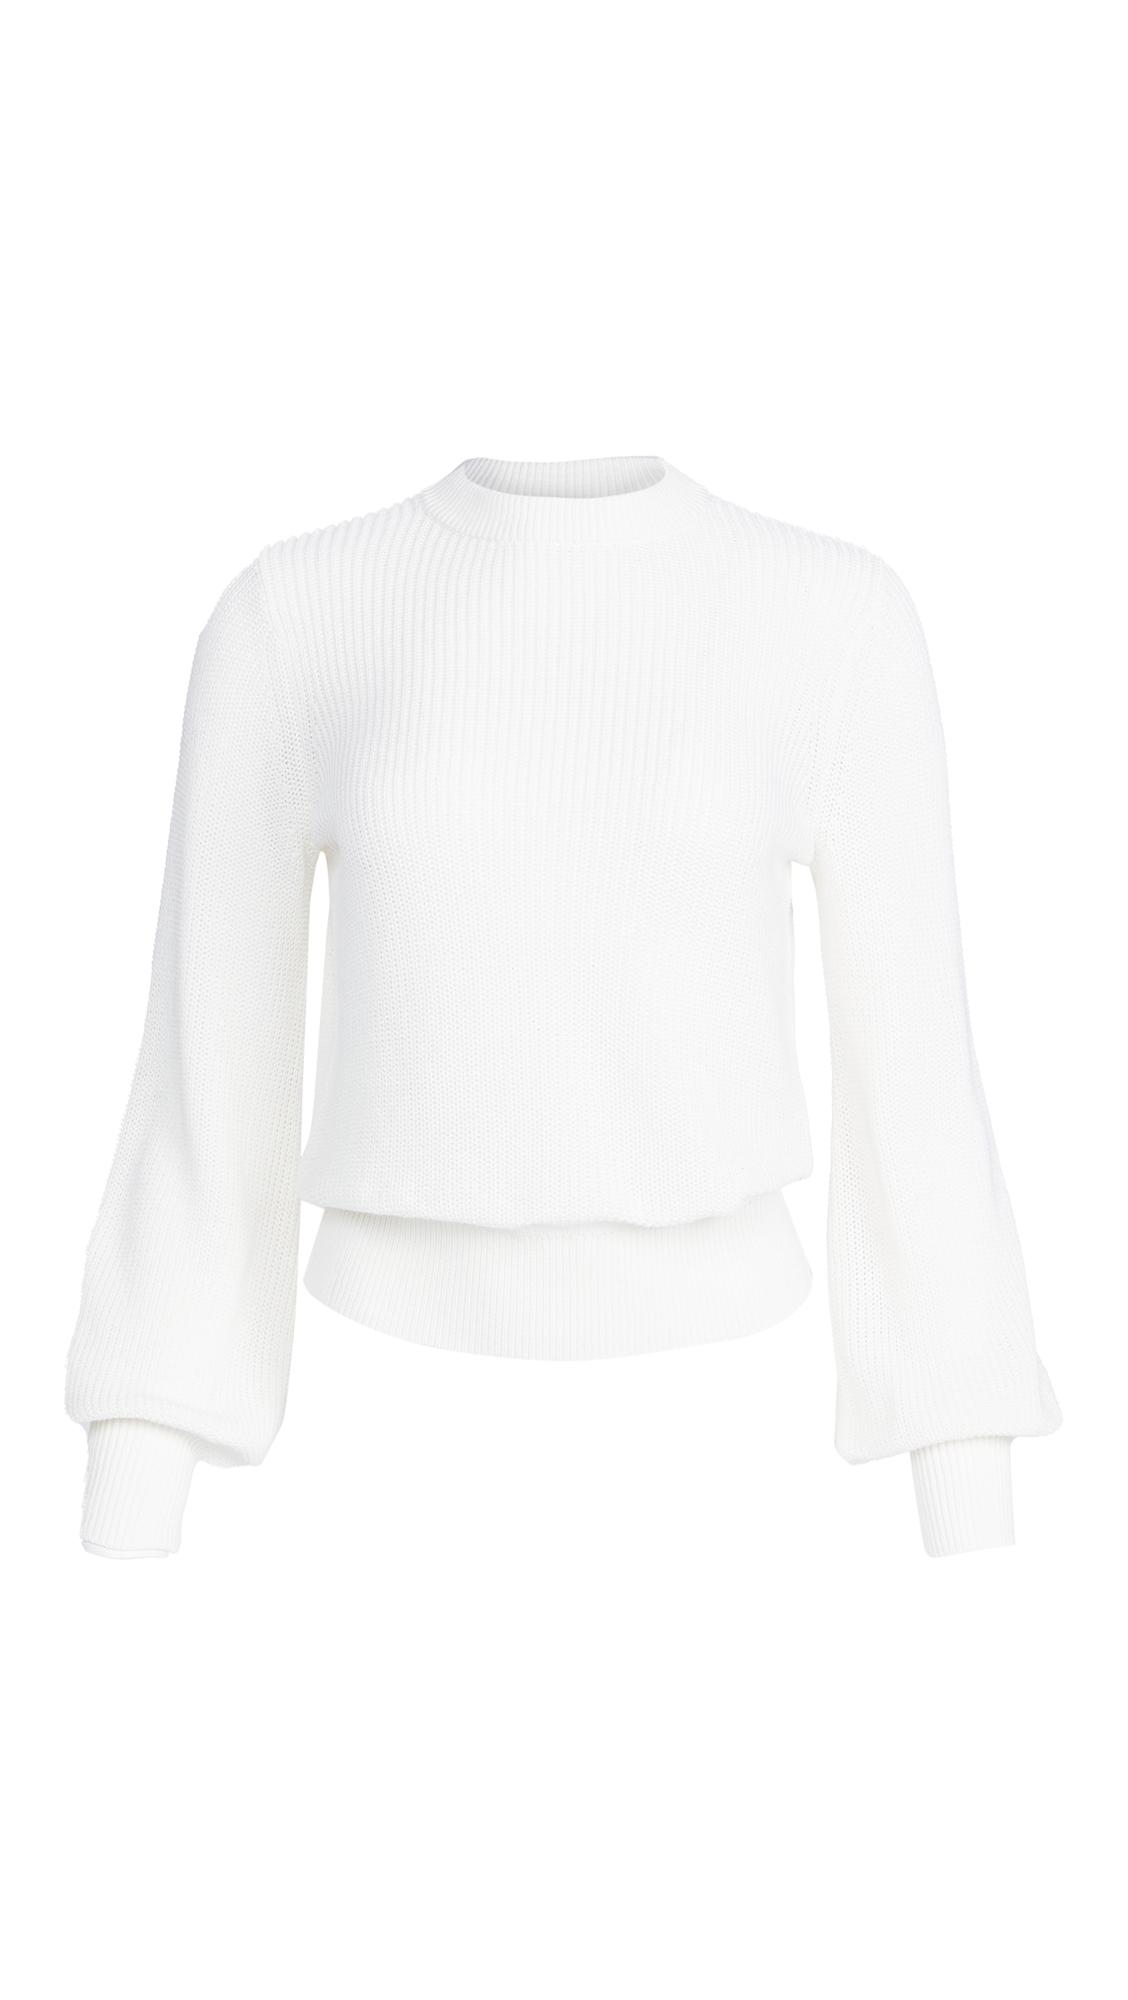 DEMYLEE Berkley Sweater